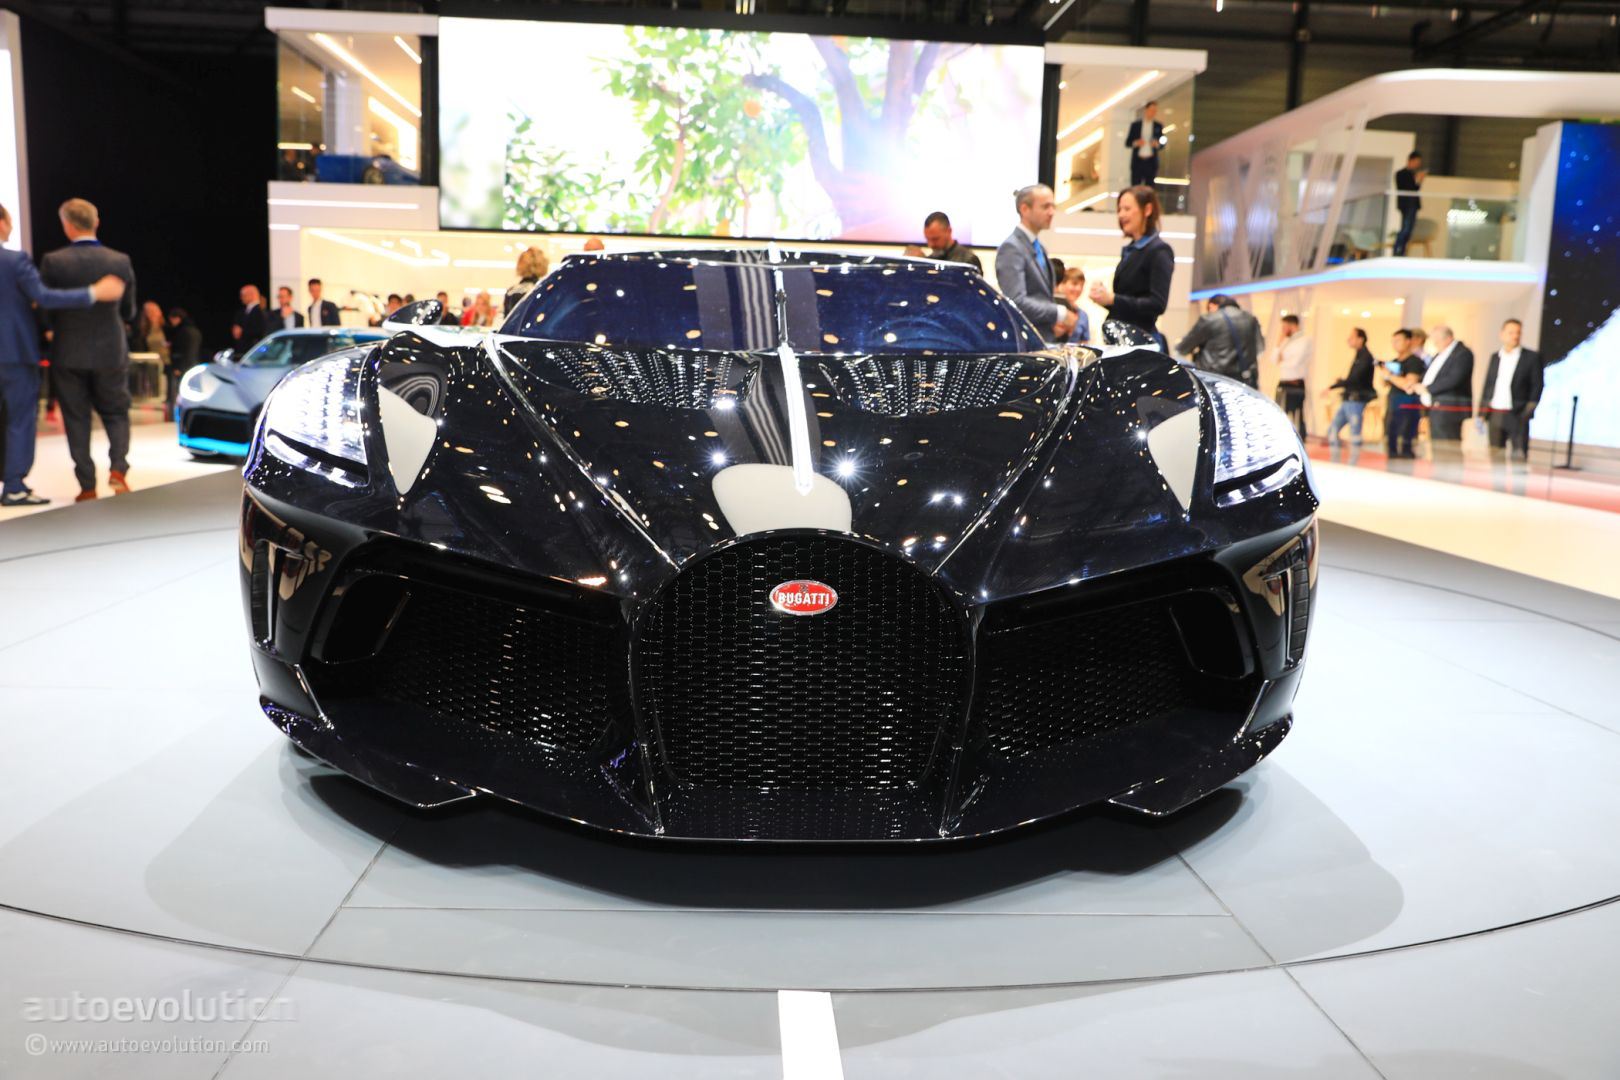 UPDATE: $19M Bugatti La Voiture Noire Geneva Car Is a ...